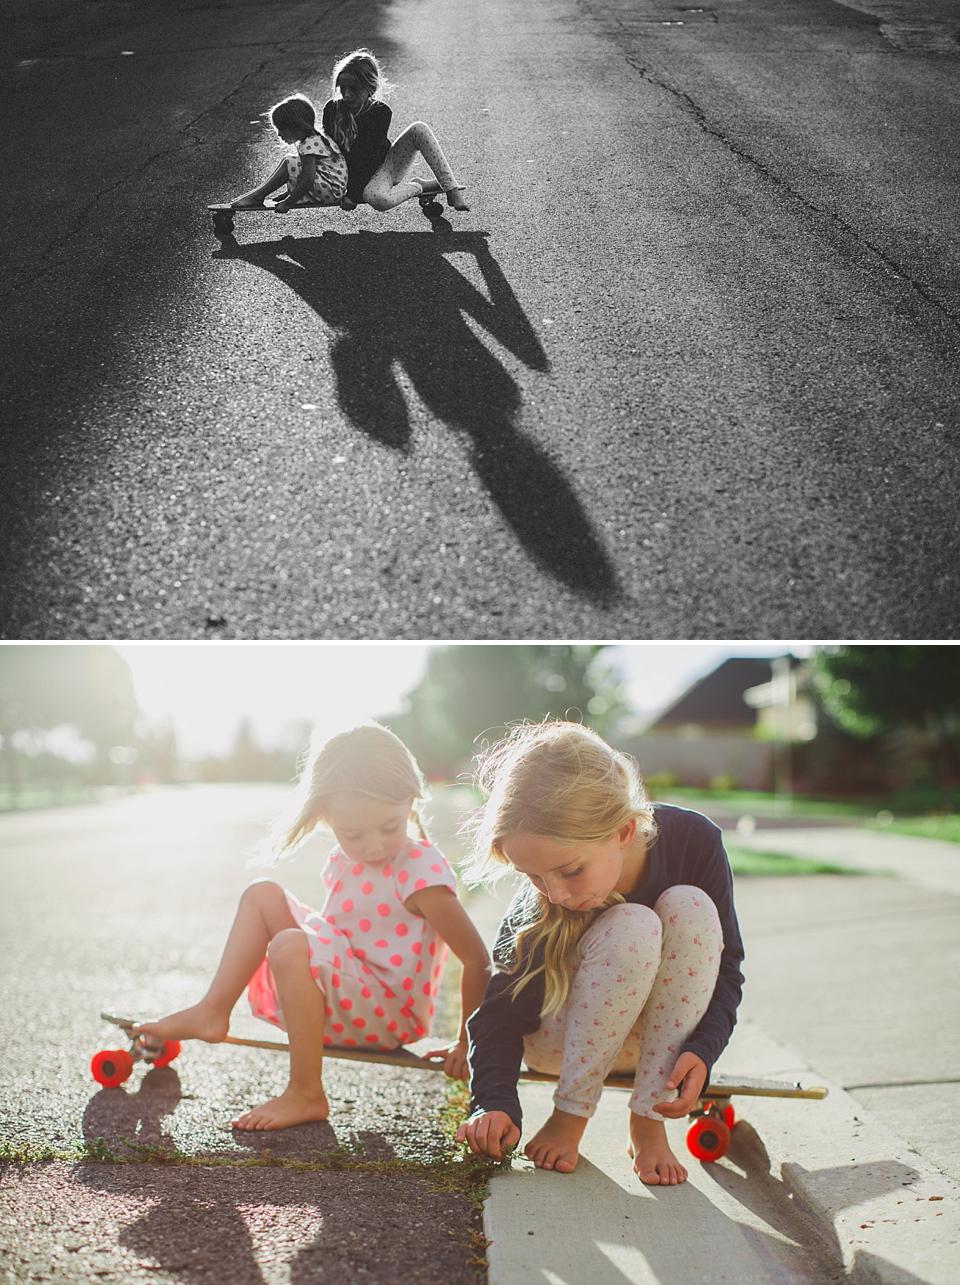 Summer Murdock Photography day 274/365